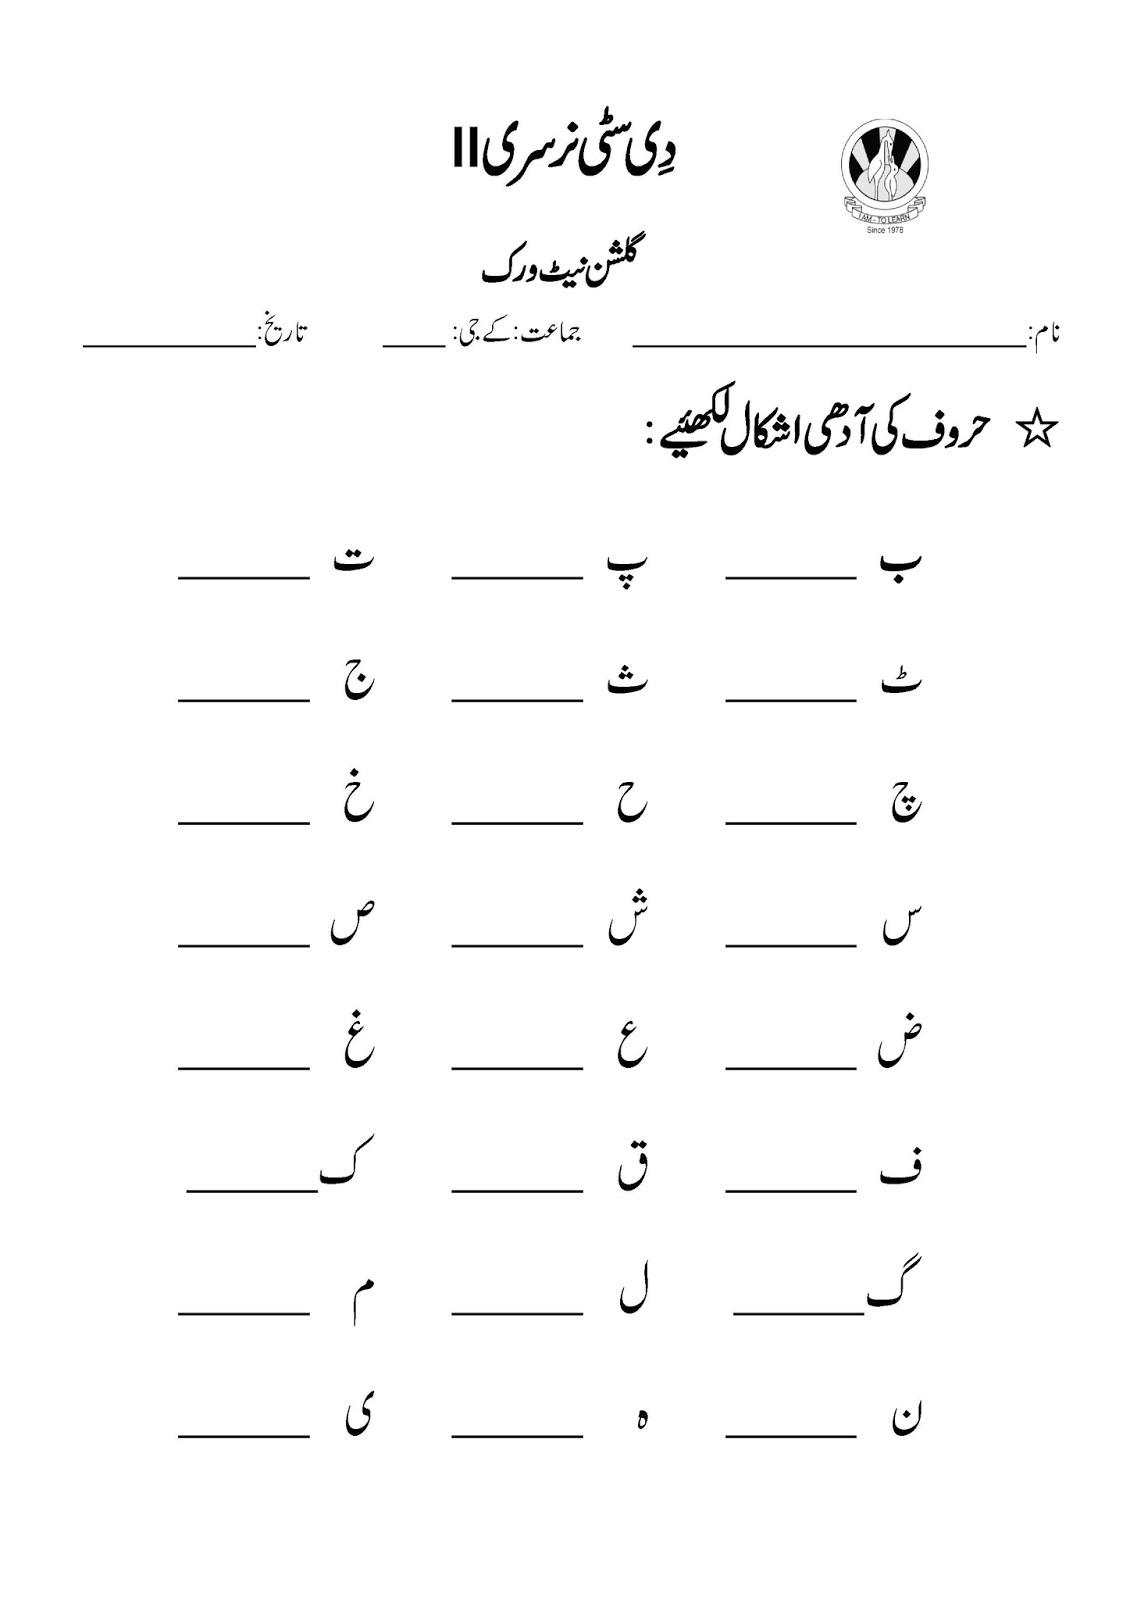 hight resolution of Kg Urdu Worksheets   Printable Worksheets and Activities for Teachers